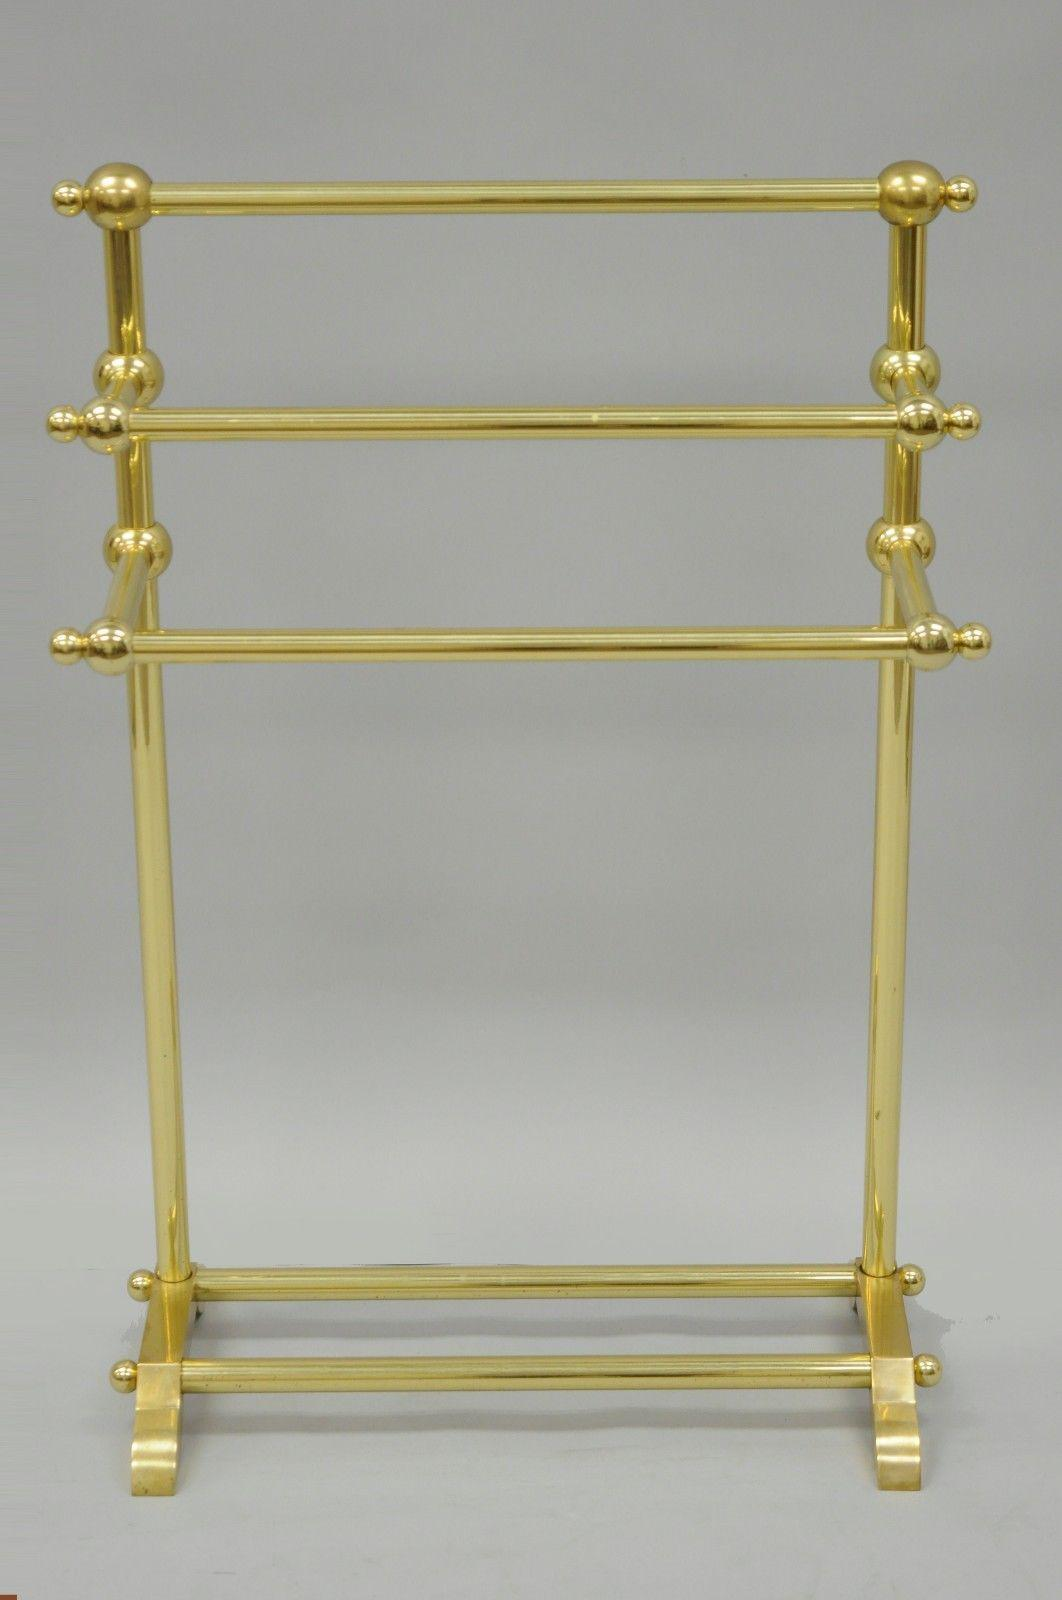 towel holder stand chrome traditional vintage solid polished brass victorian style bathroom towel rack stand holder gold for sale